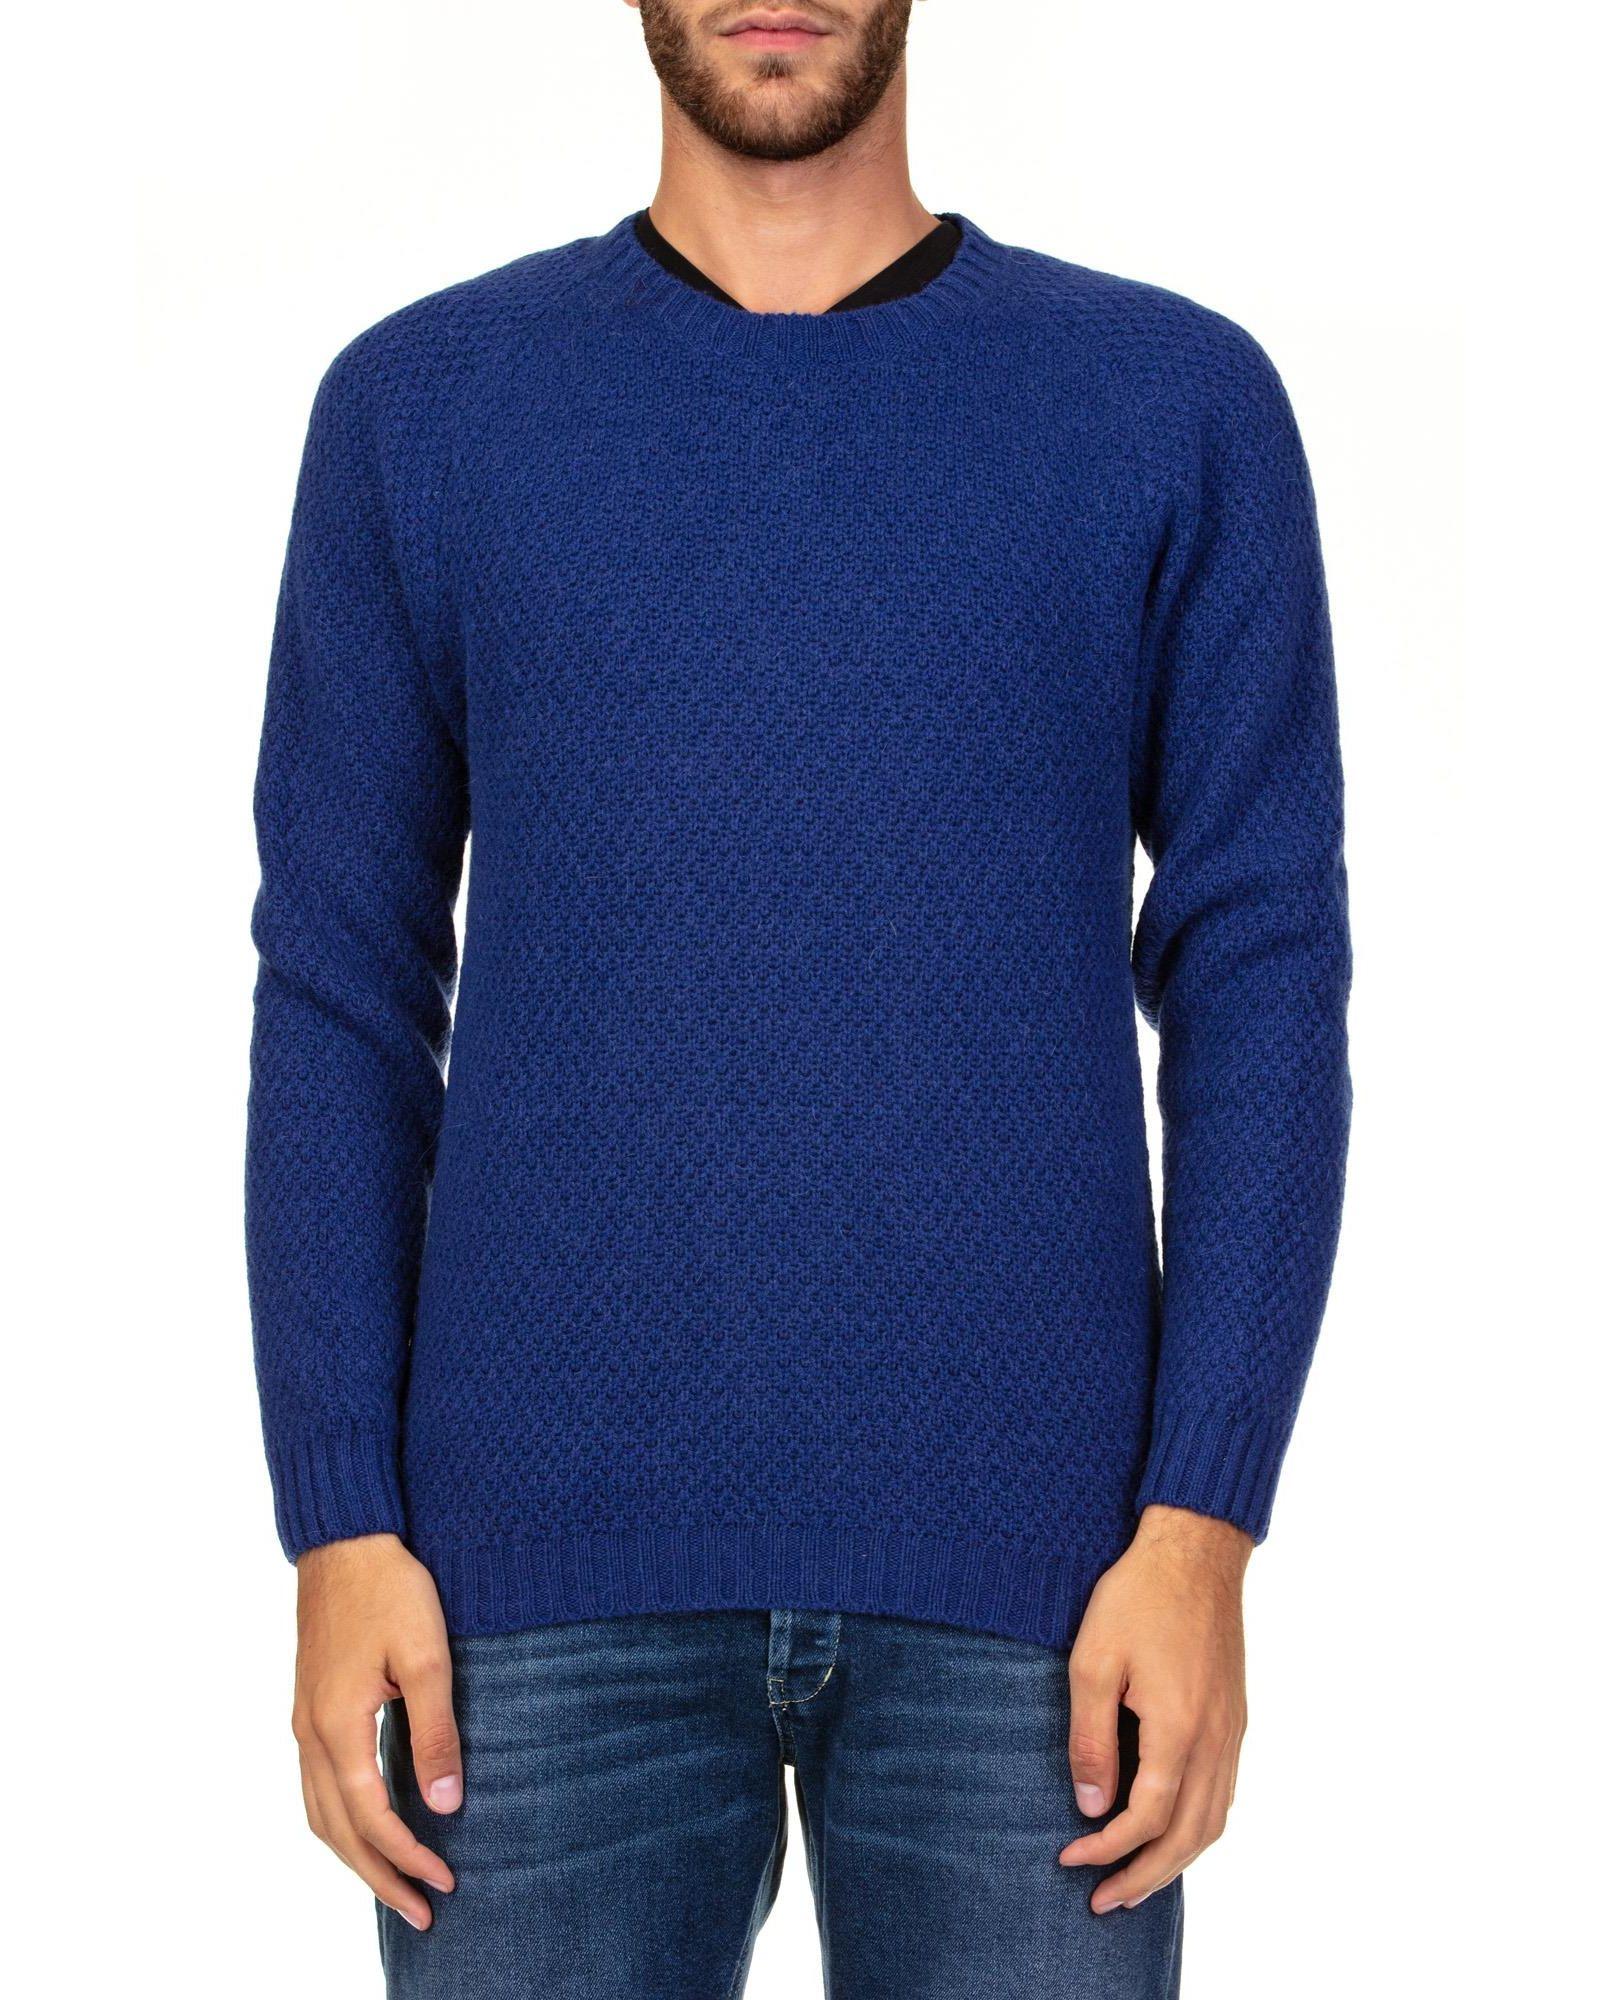 DANIELE FIESOLI Baby Alpaca And Merino Wool Sweater in Bluet